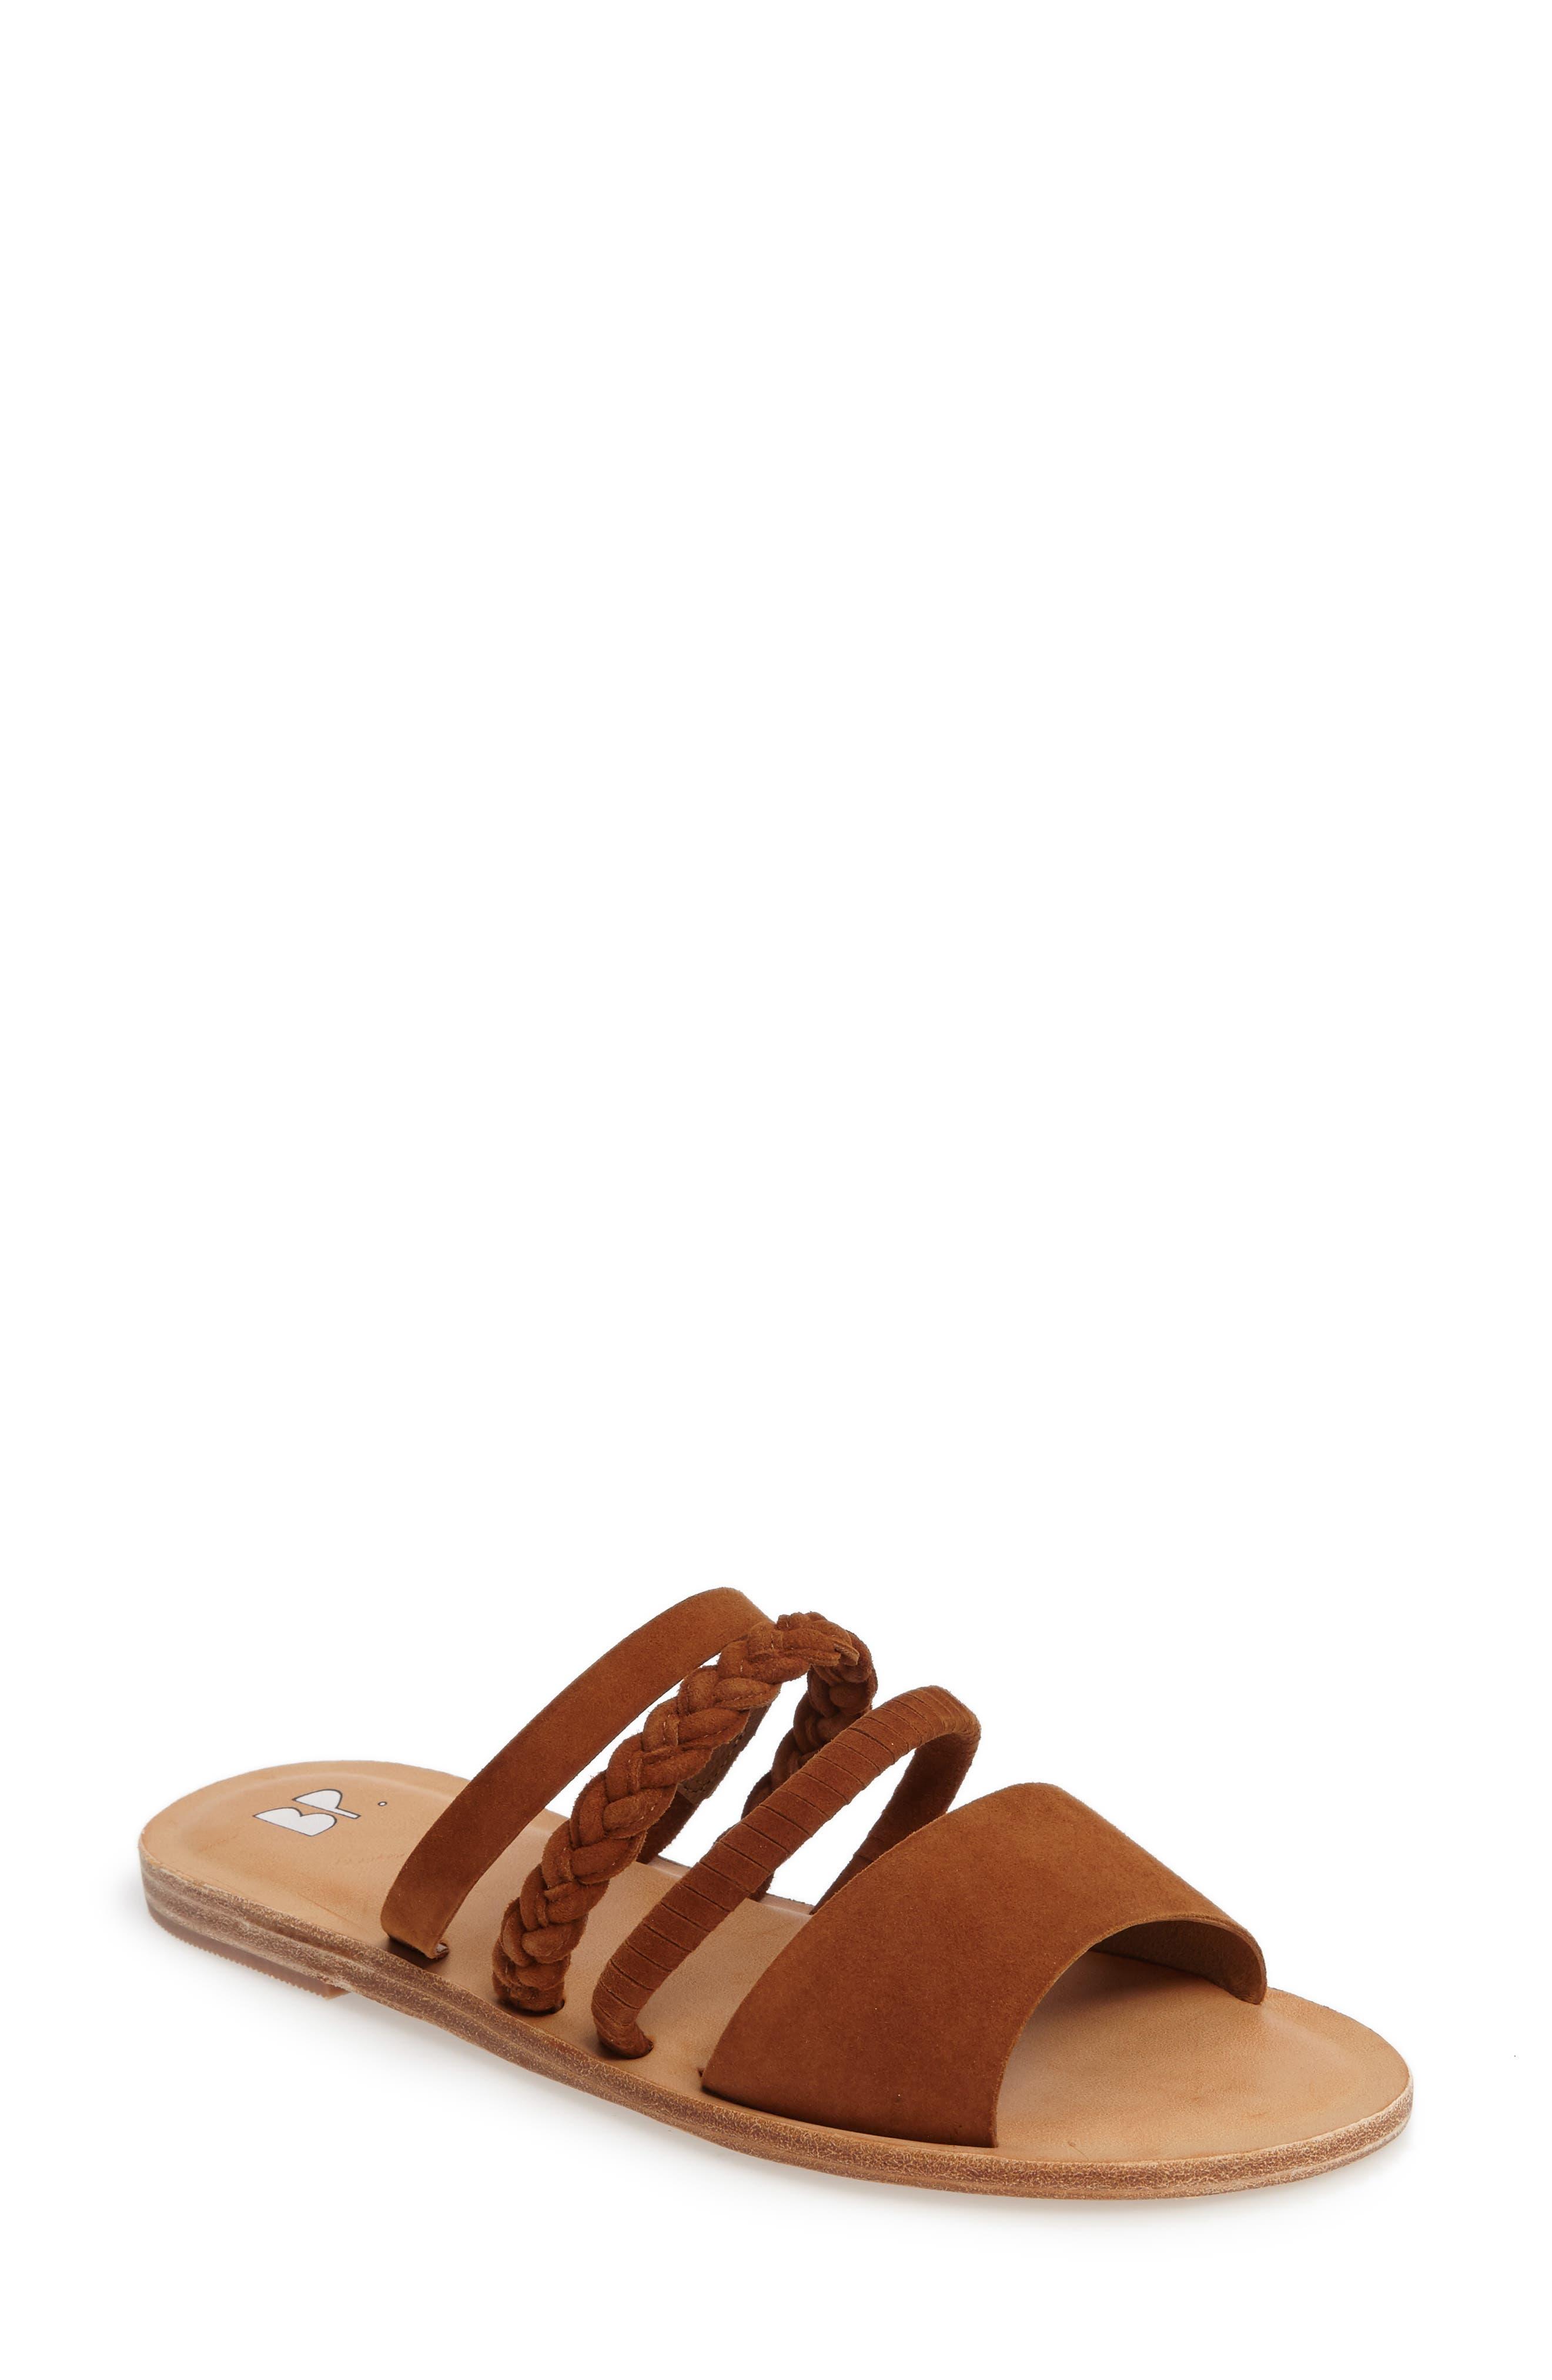 BP., Bayla Strappy Slip-On Sandal, Main thumbnail 1, color, 202